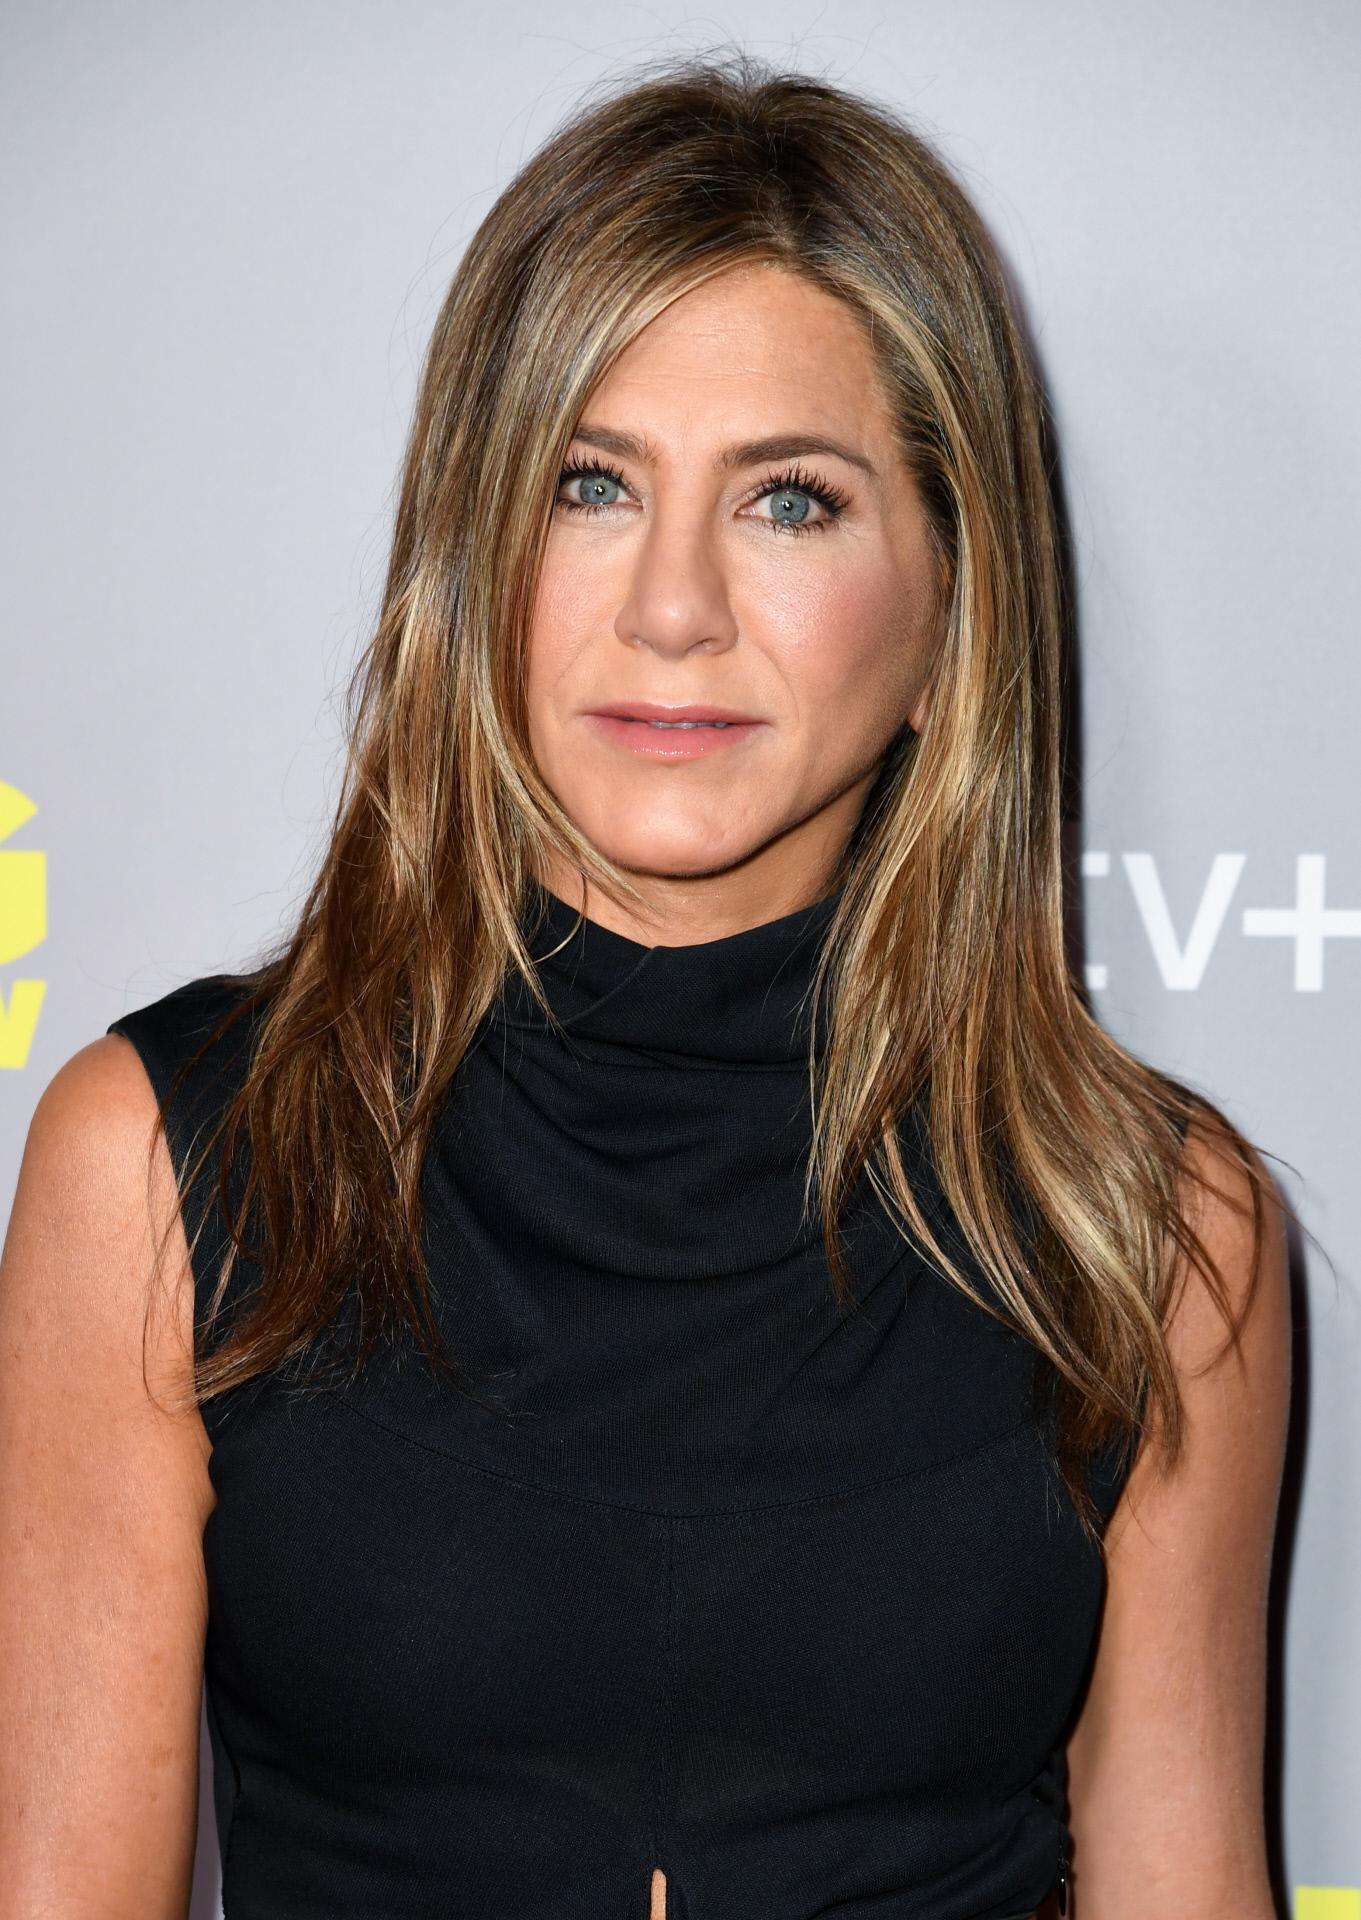 Jennifer Aniston es fan del tratamiento de keratina.